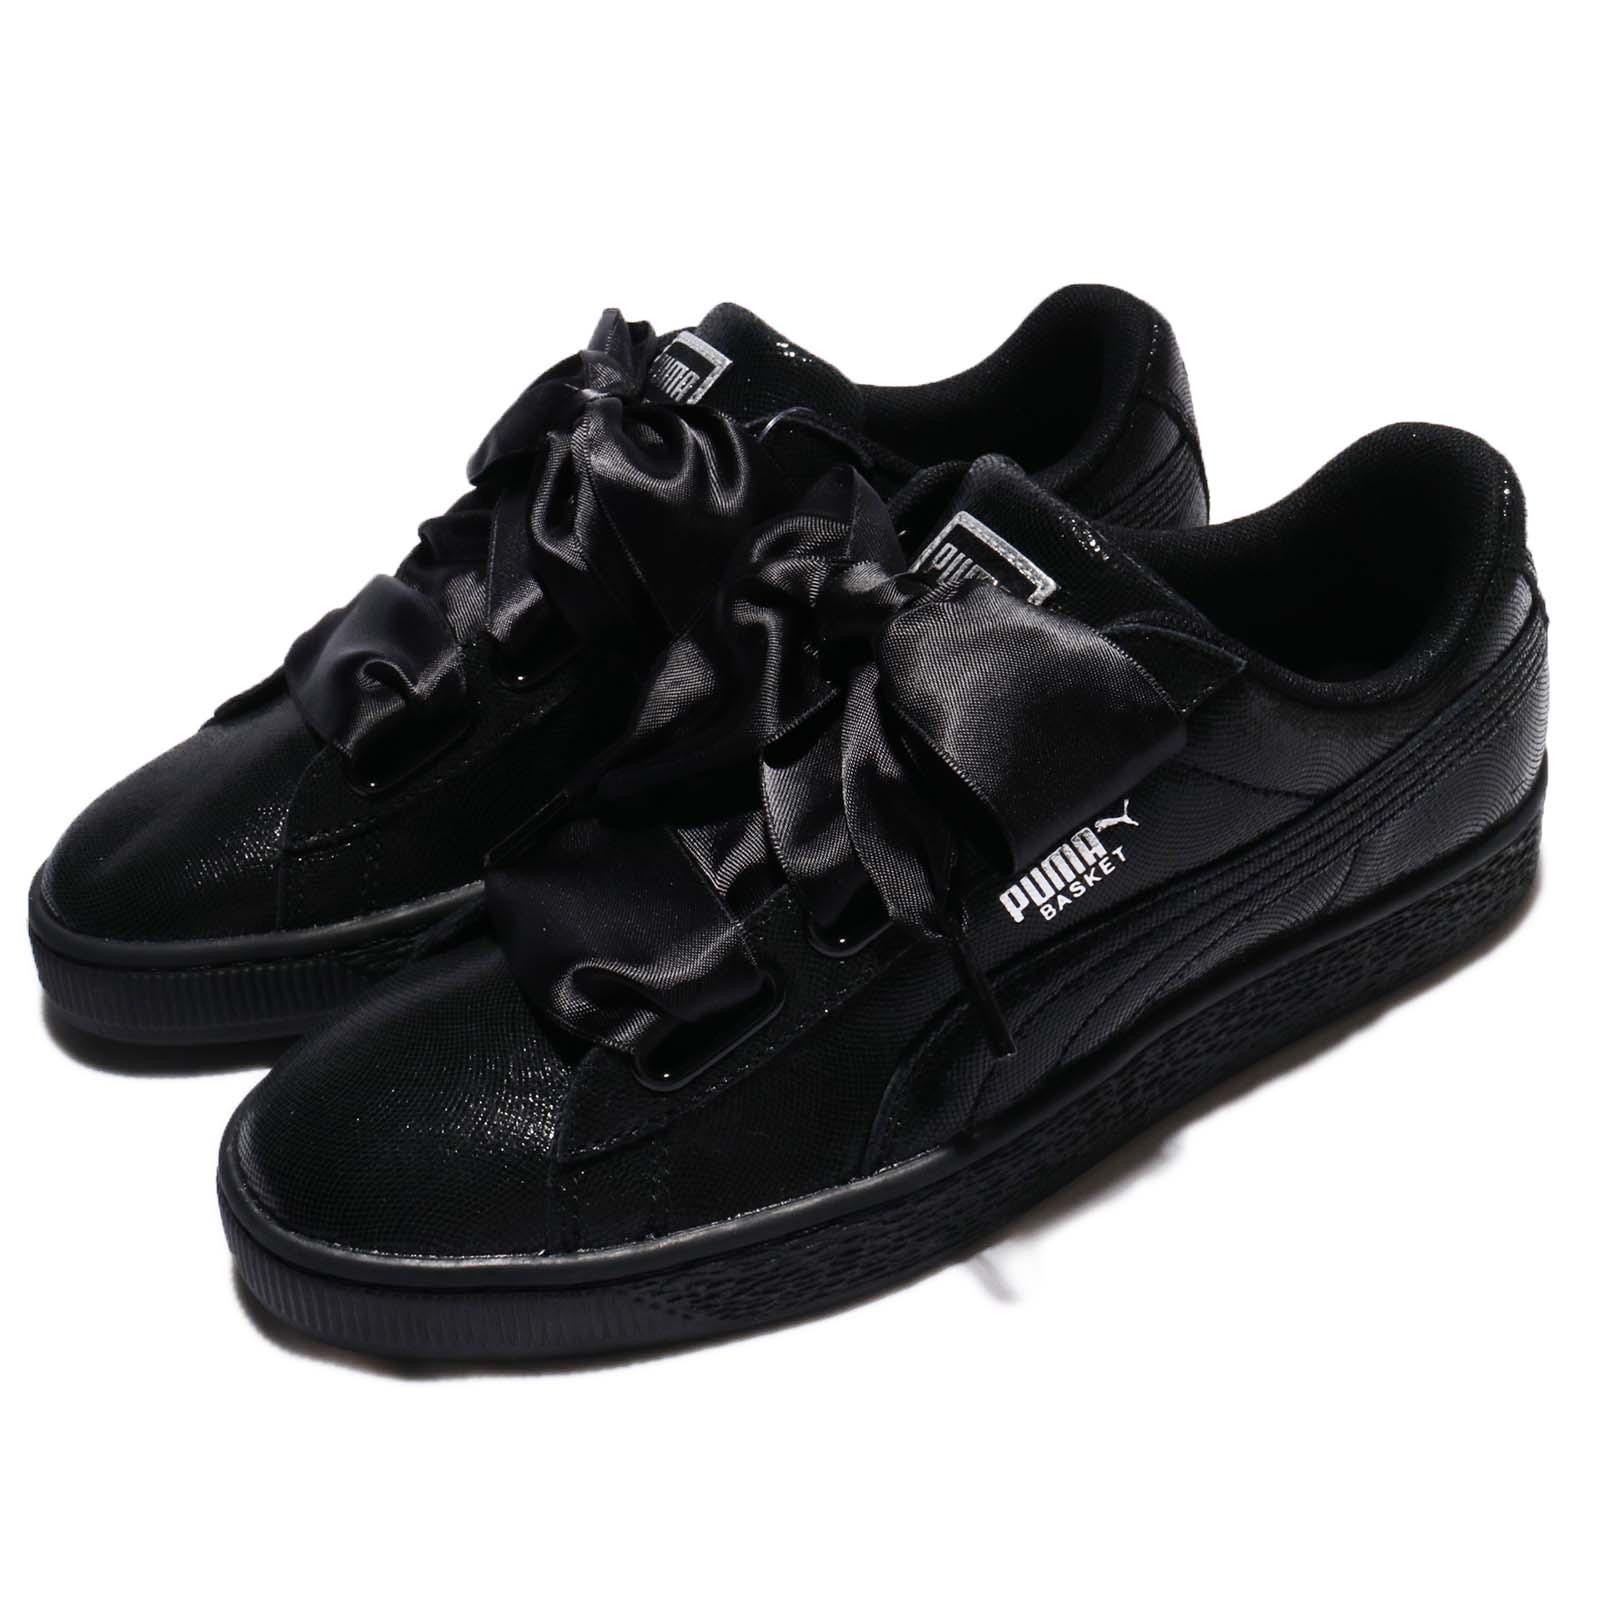 Puma 休閒鞋 Basket Heart 女鞋 36410801